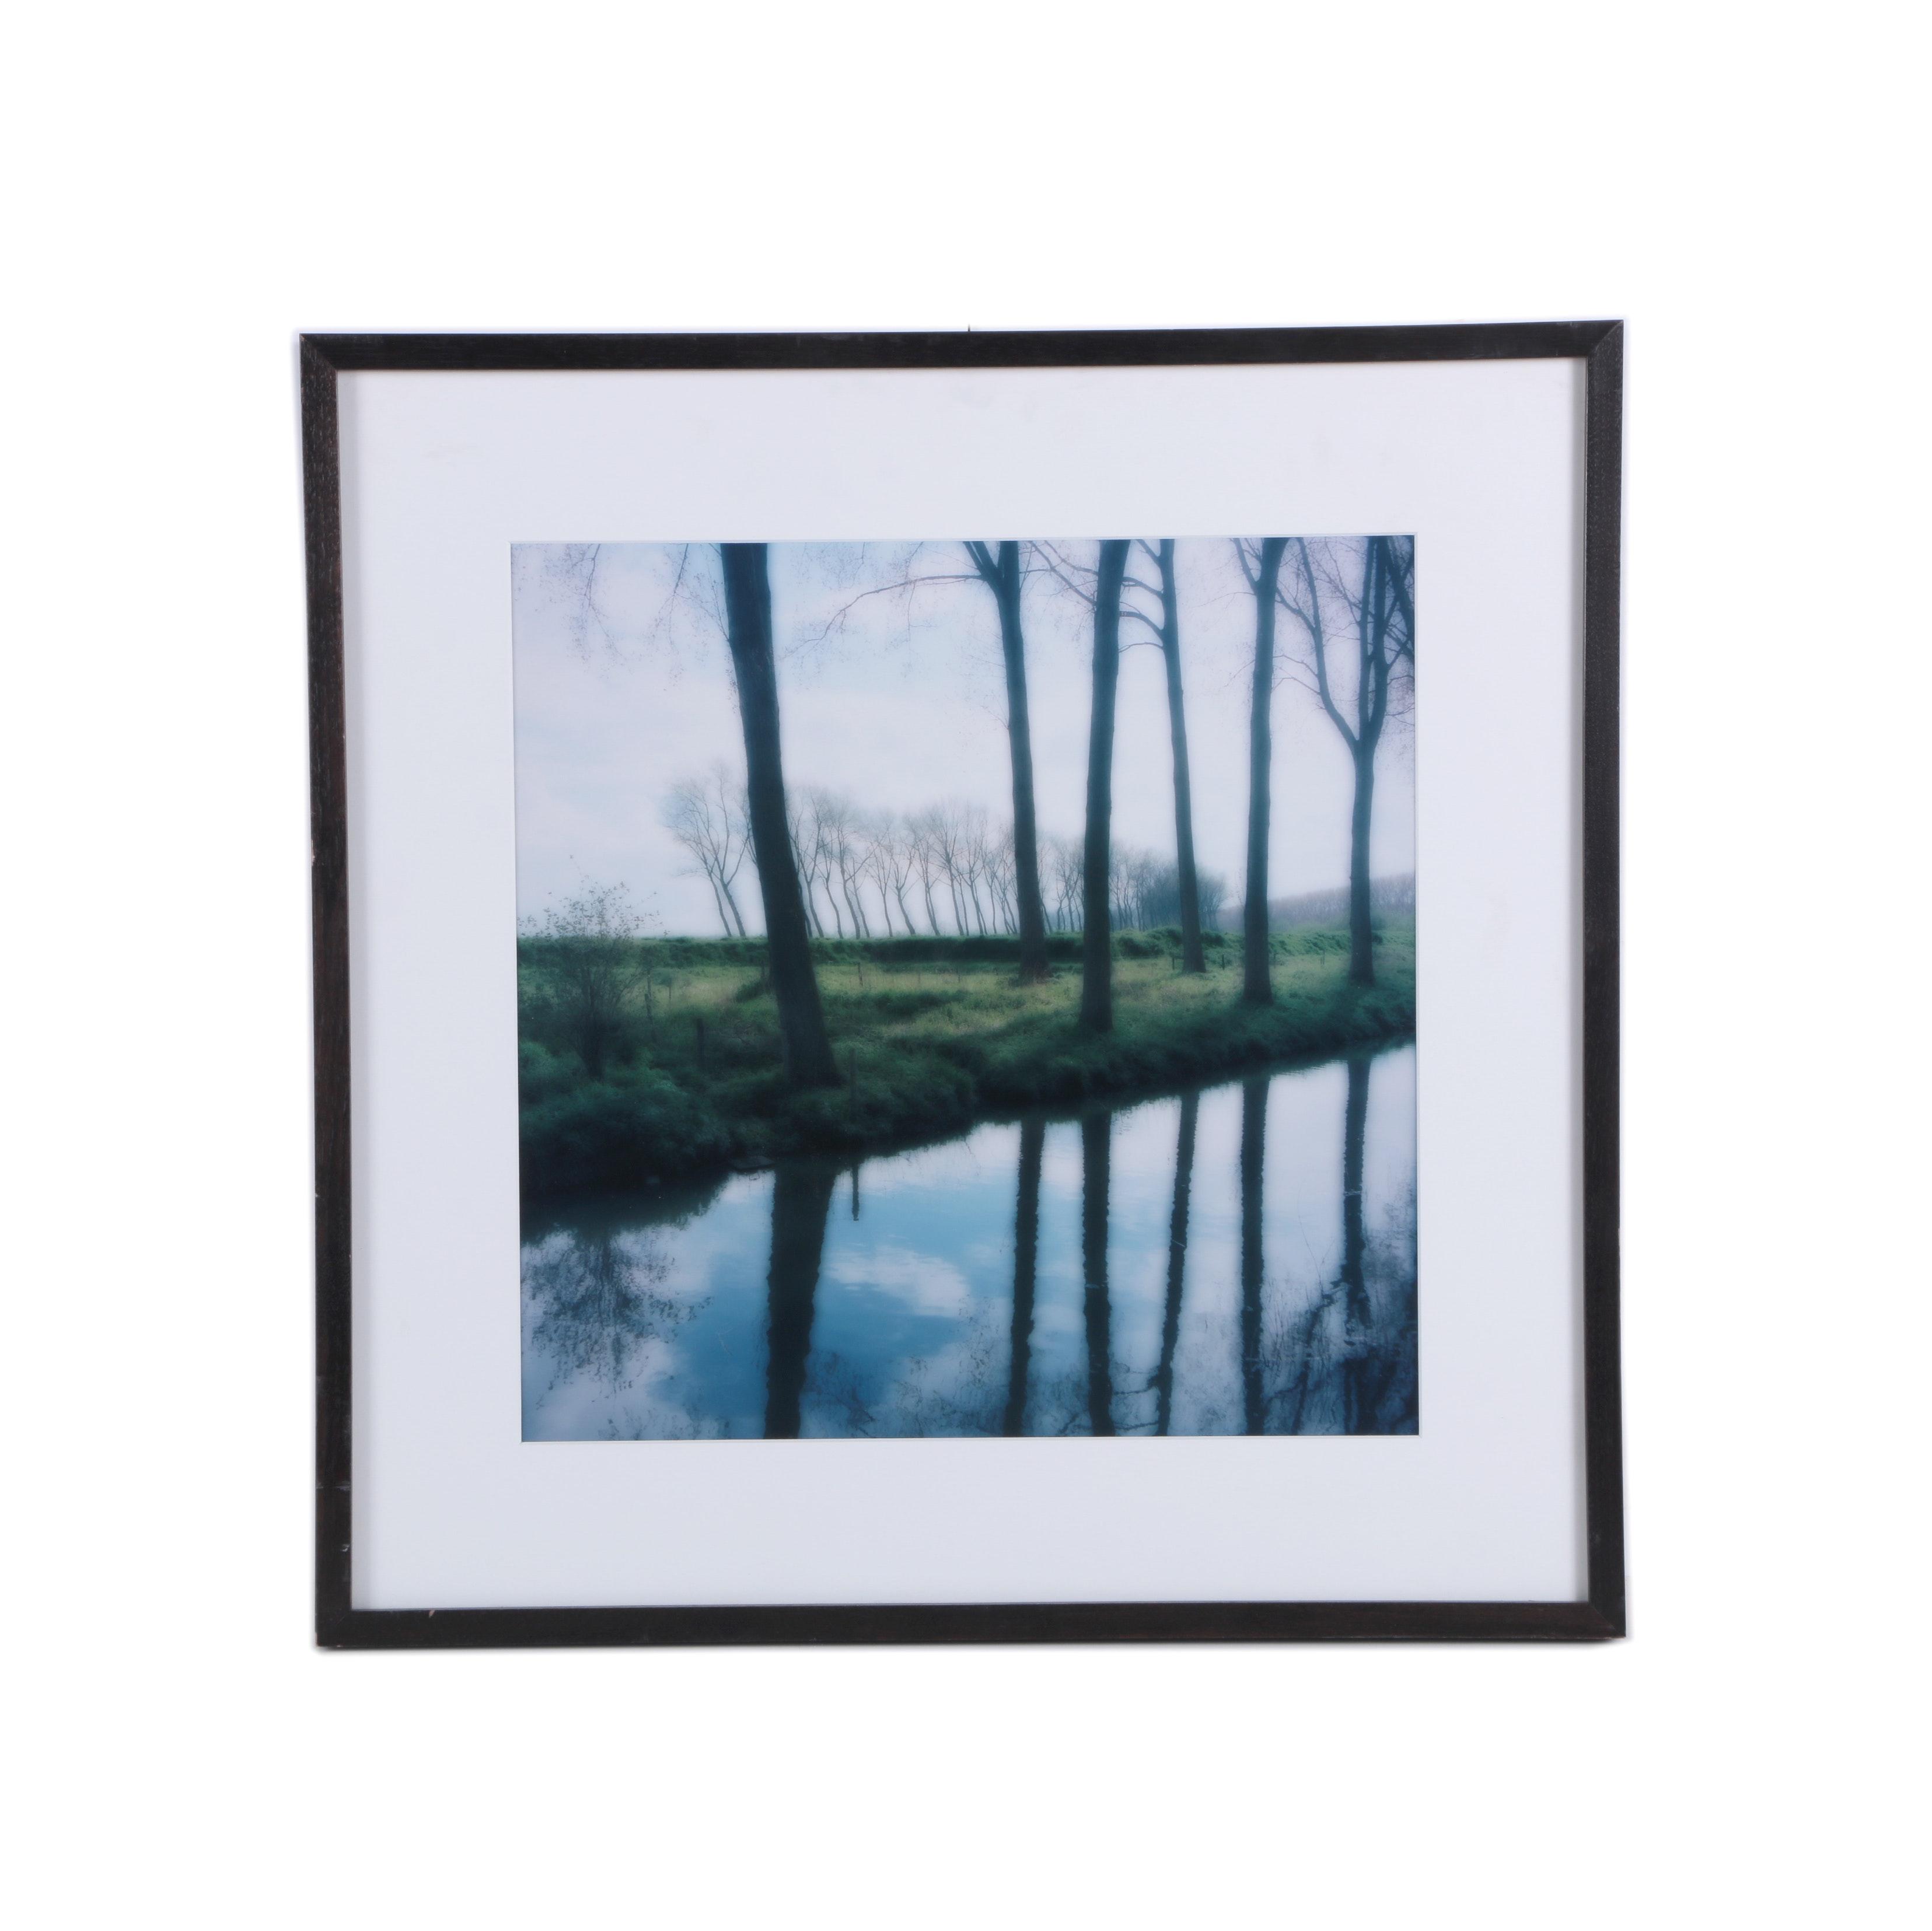 "Limited Edition Chromogenic Print After Lynn Geesaman ""Damme, Belgium, 2004"""